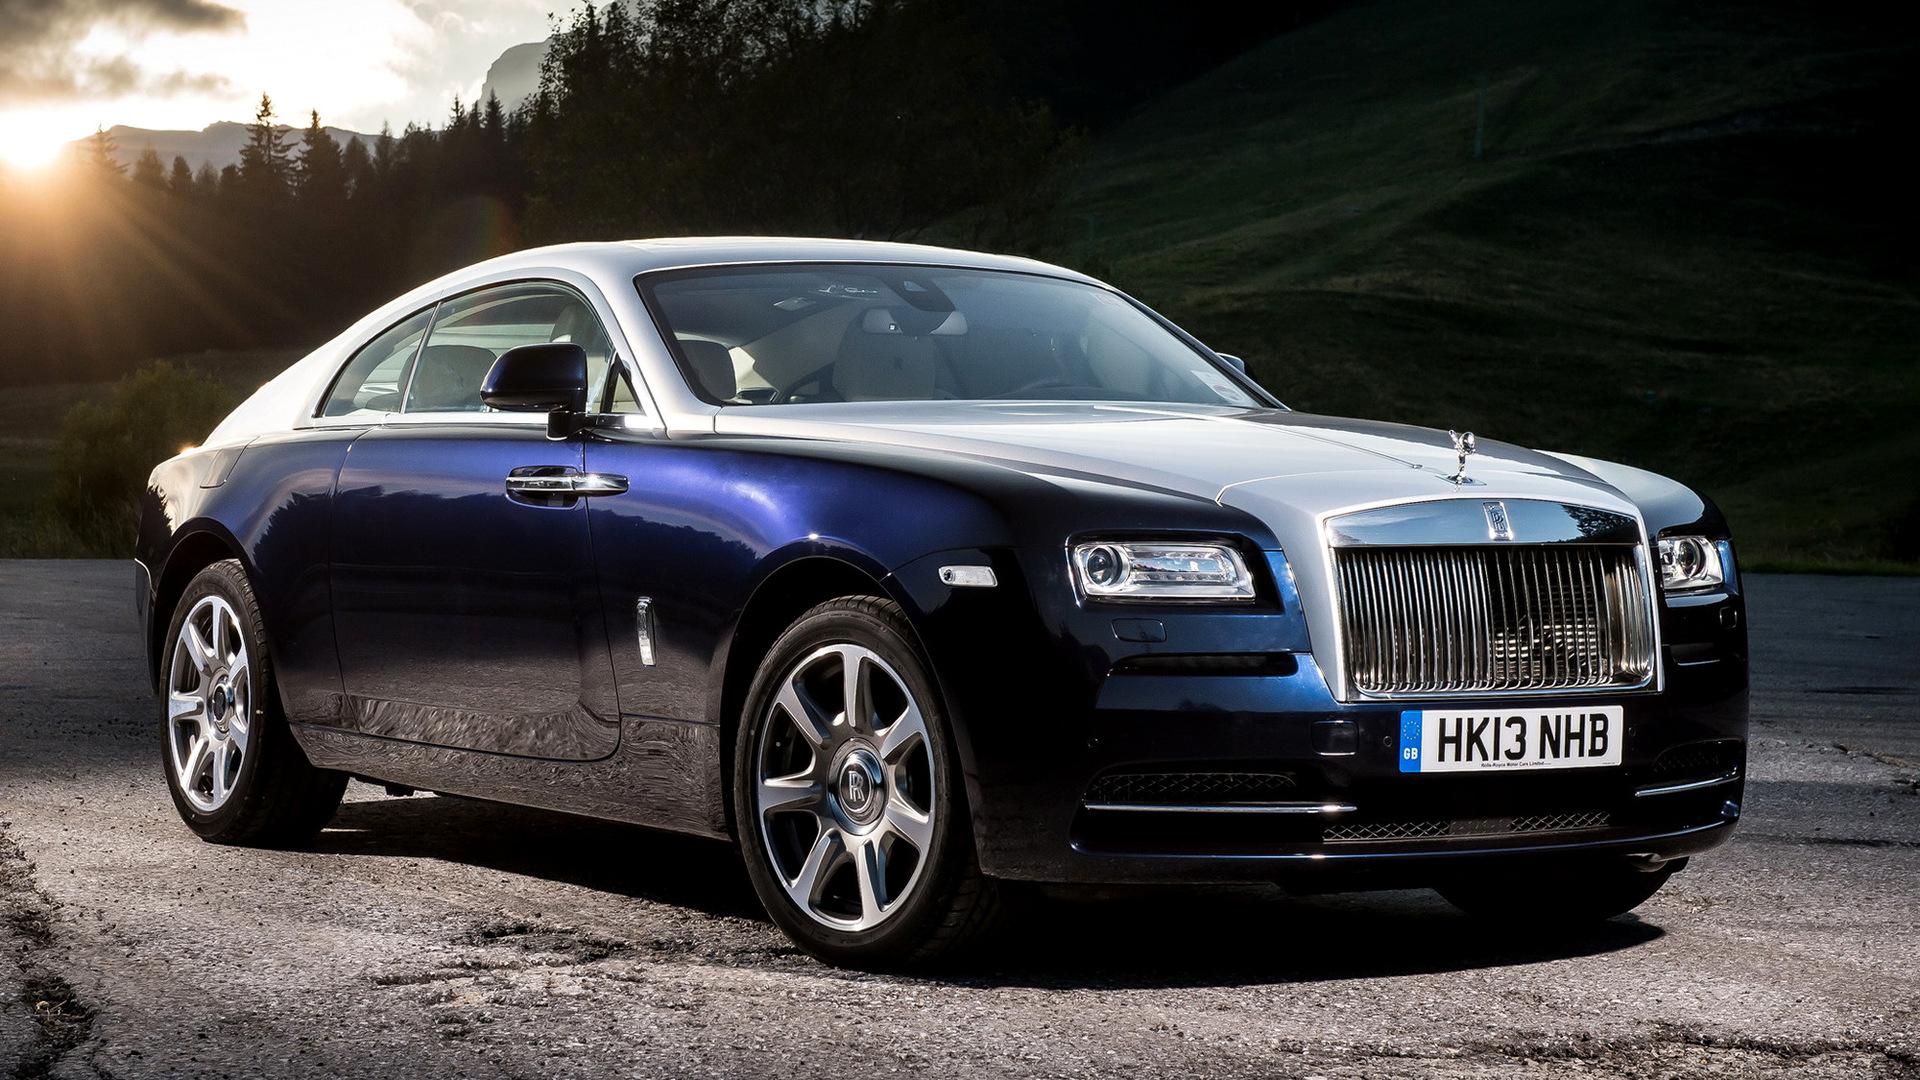 Rolls Royce Wraith Wallpapers ID942930